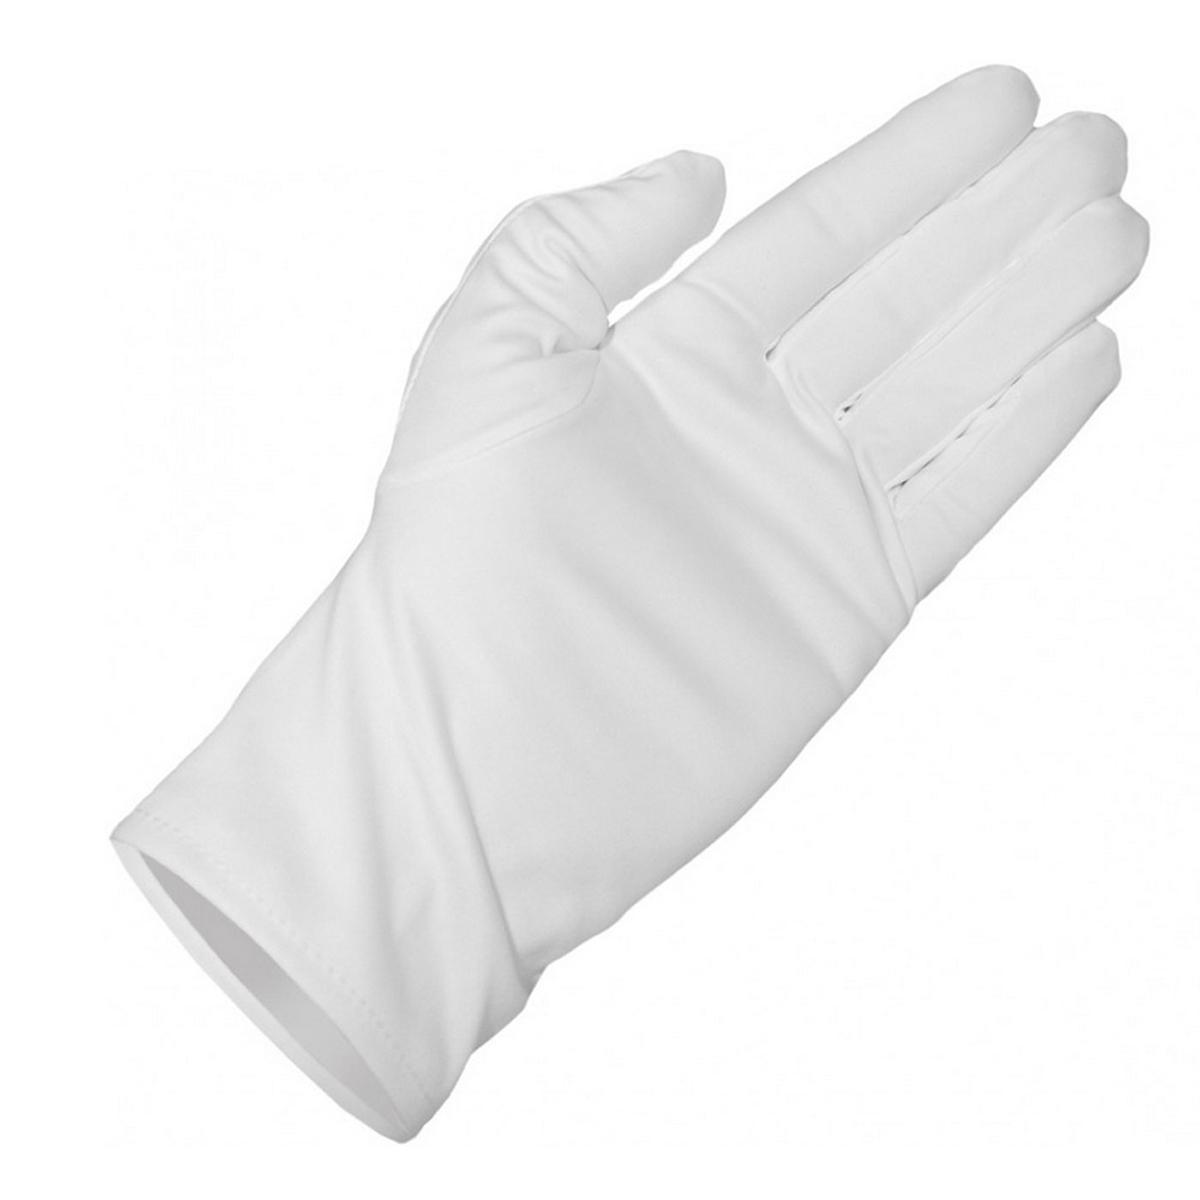 B.I.G. Microfaser-Handschuhe Größe L 2 Paar